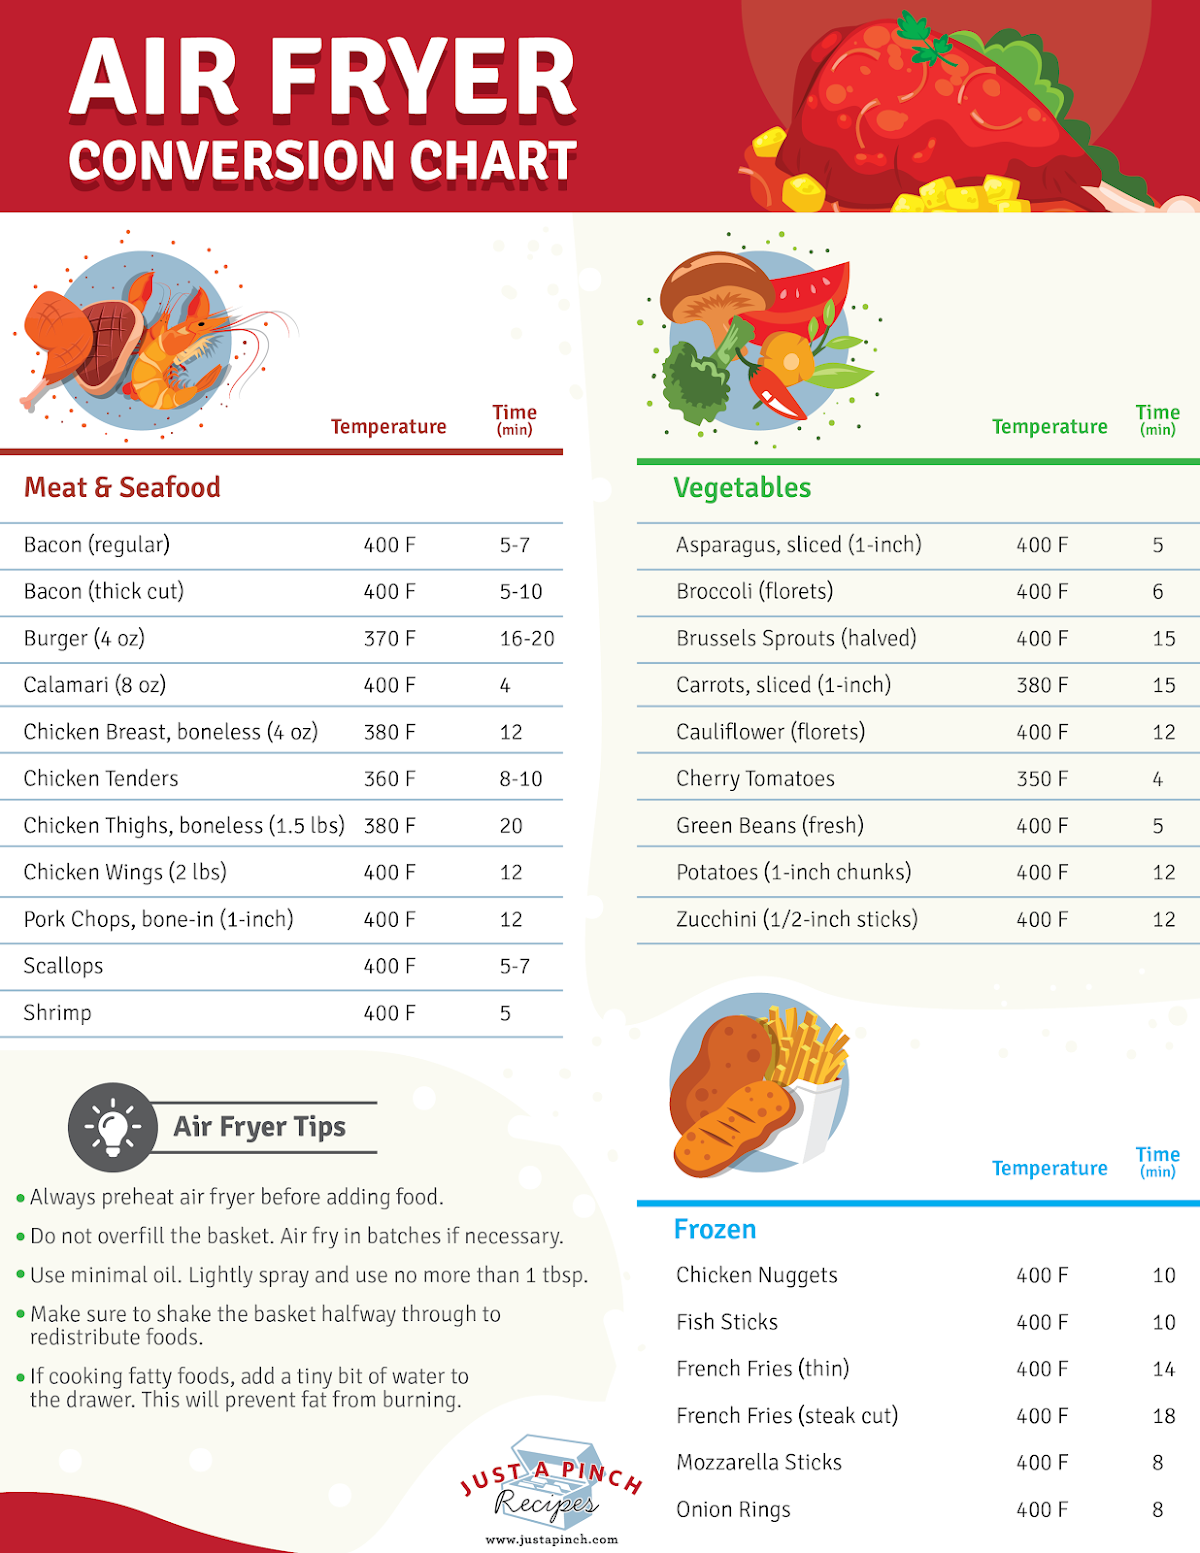 Air Fryer Conversion Chart